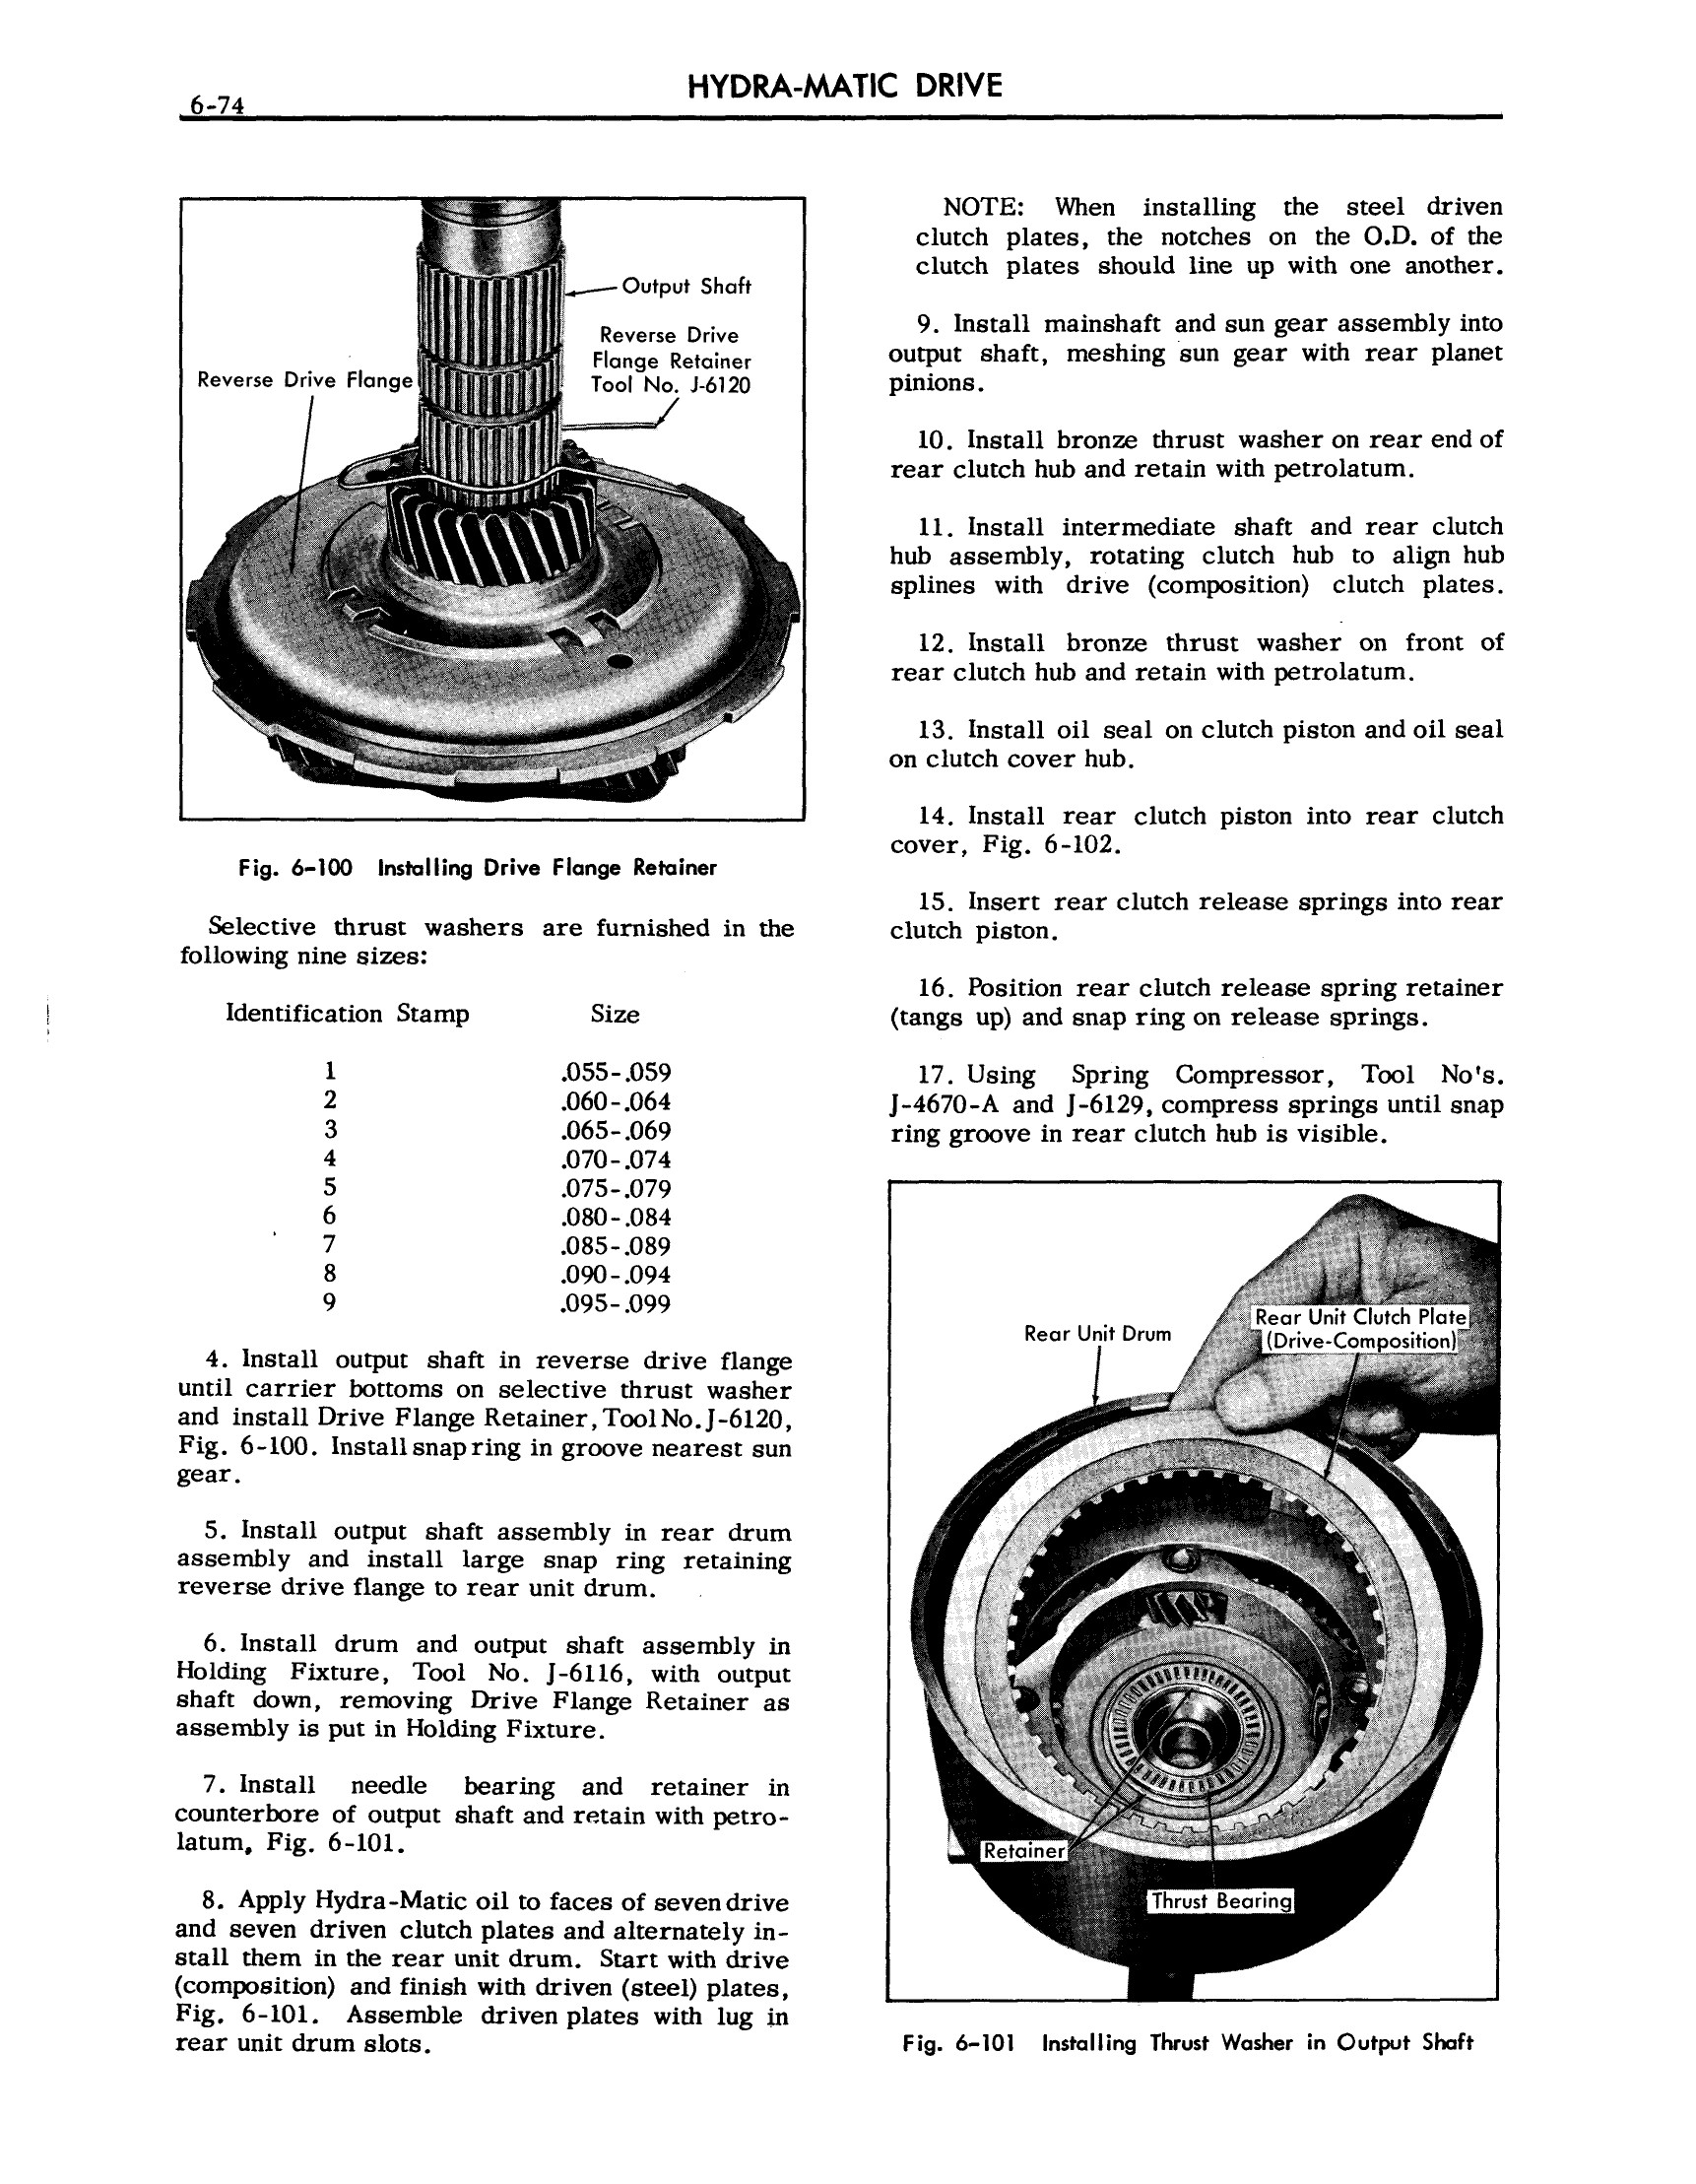 1957 Cadillac Shop Manual- Hydra-Matic Page 74 of 84